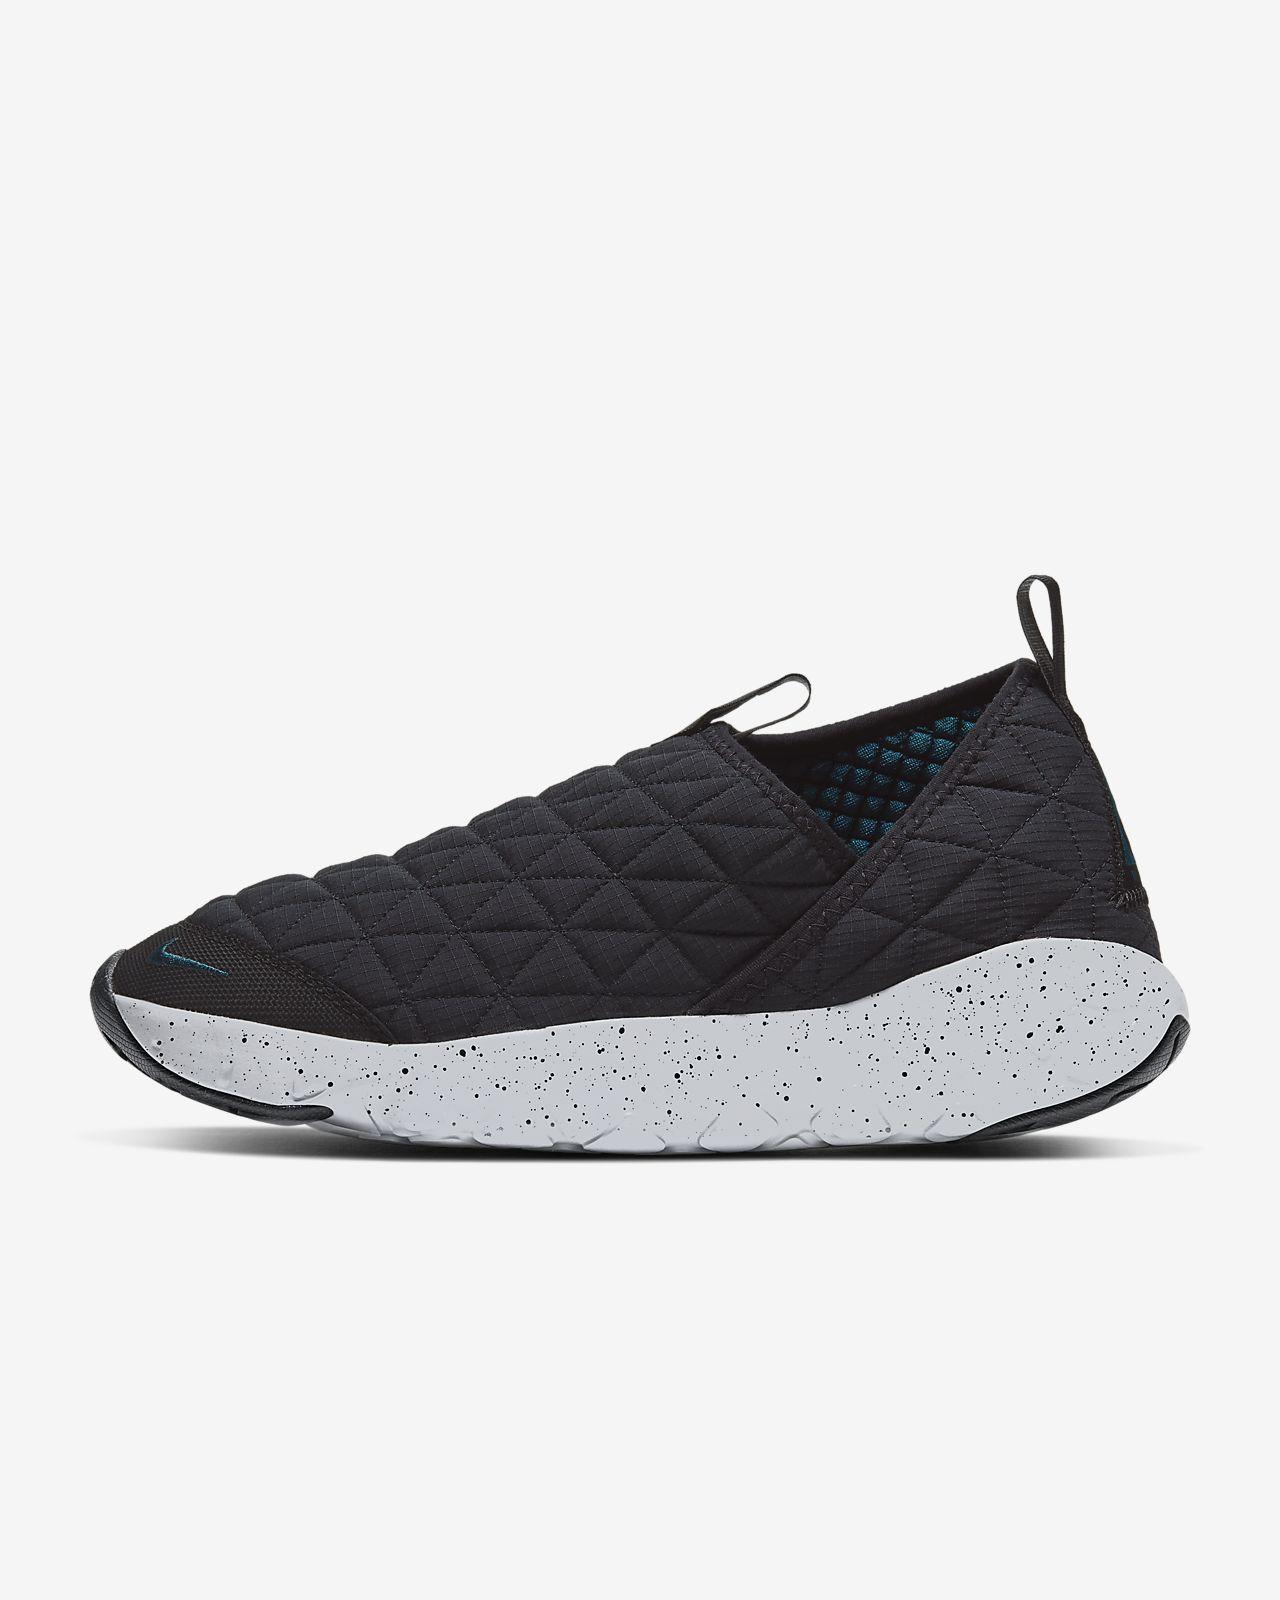 Sapatilhas Nike ACG MOC 3.0